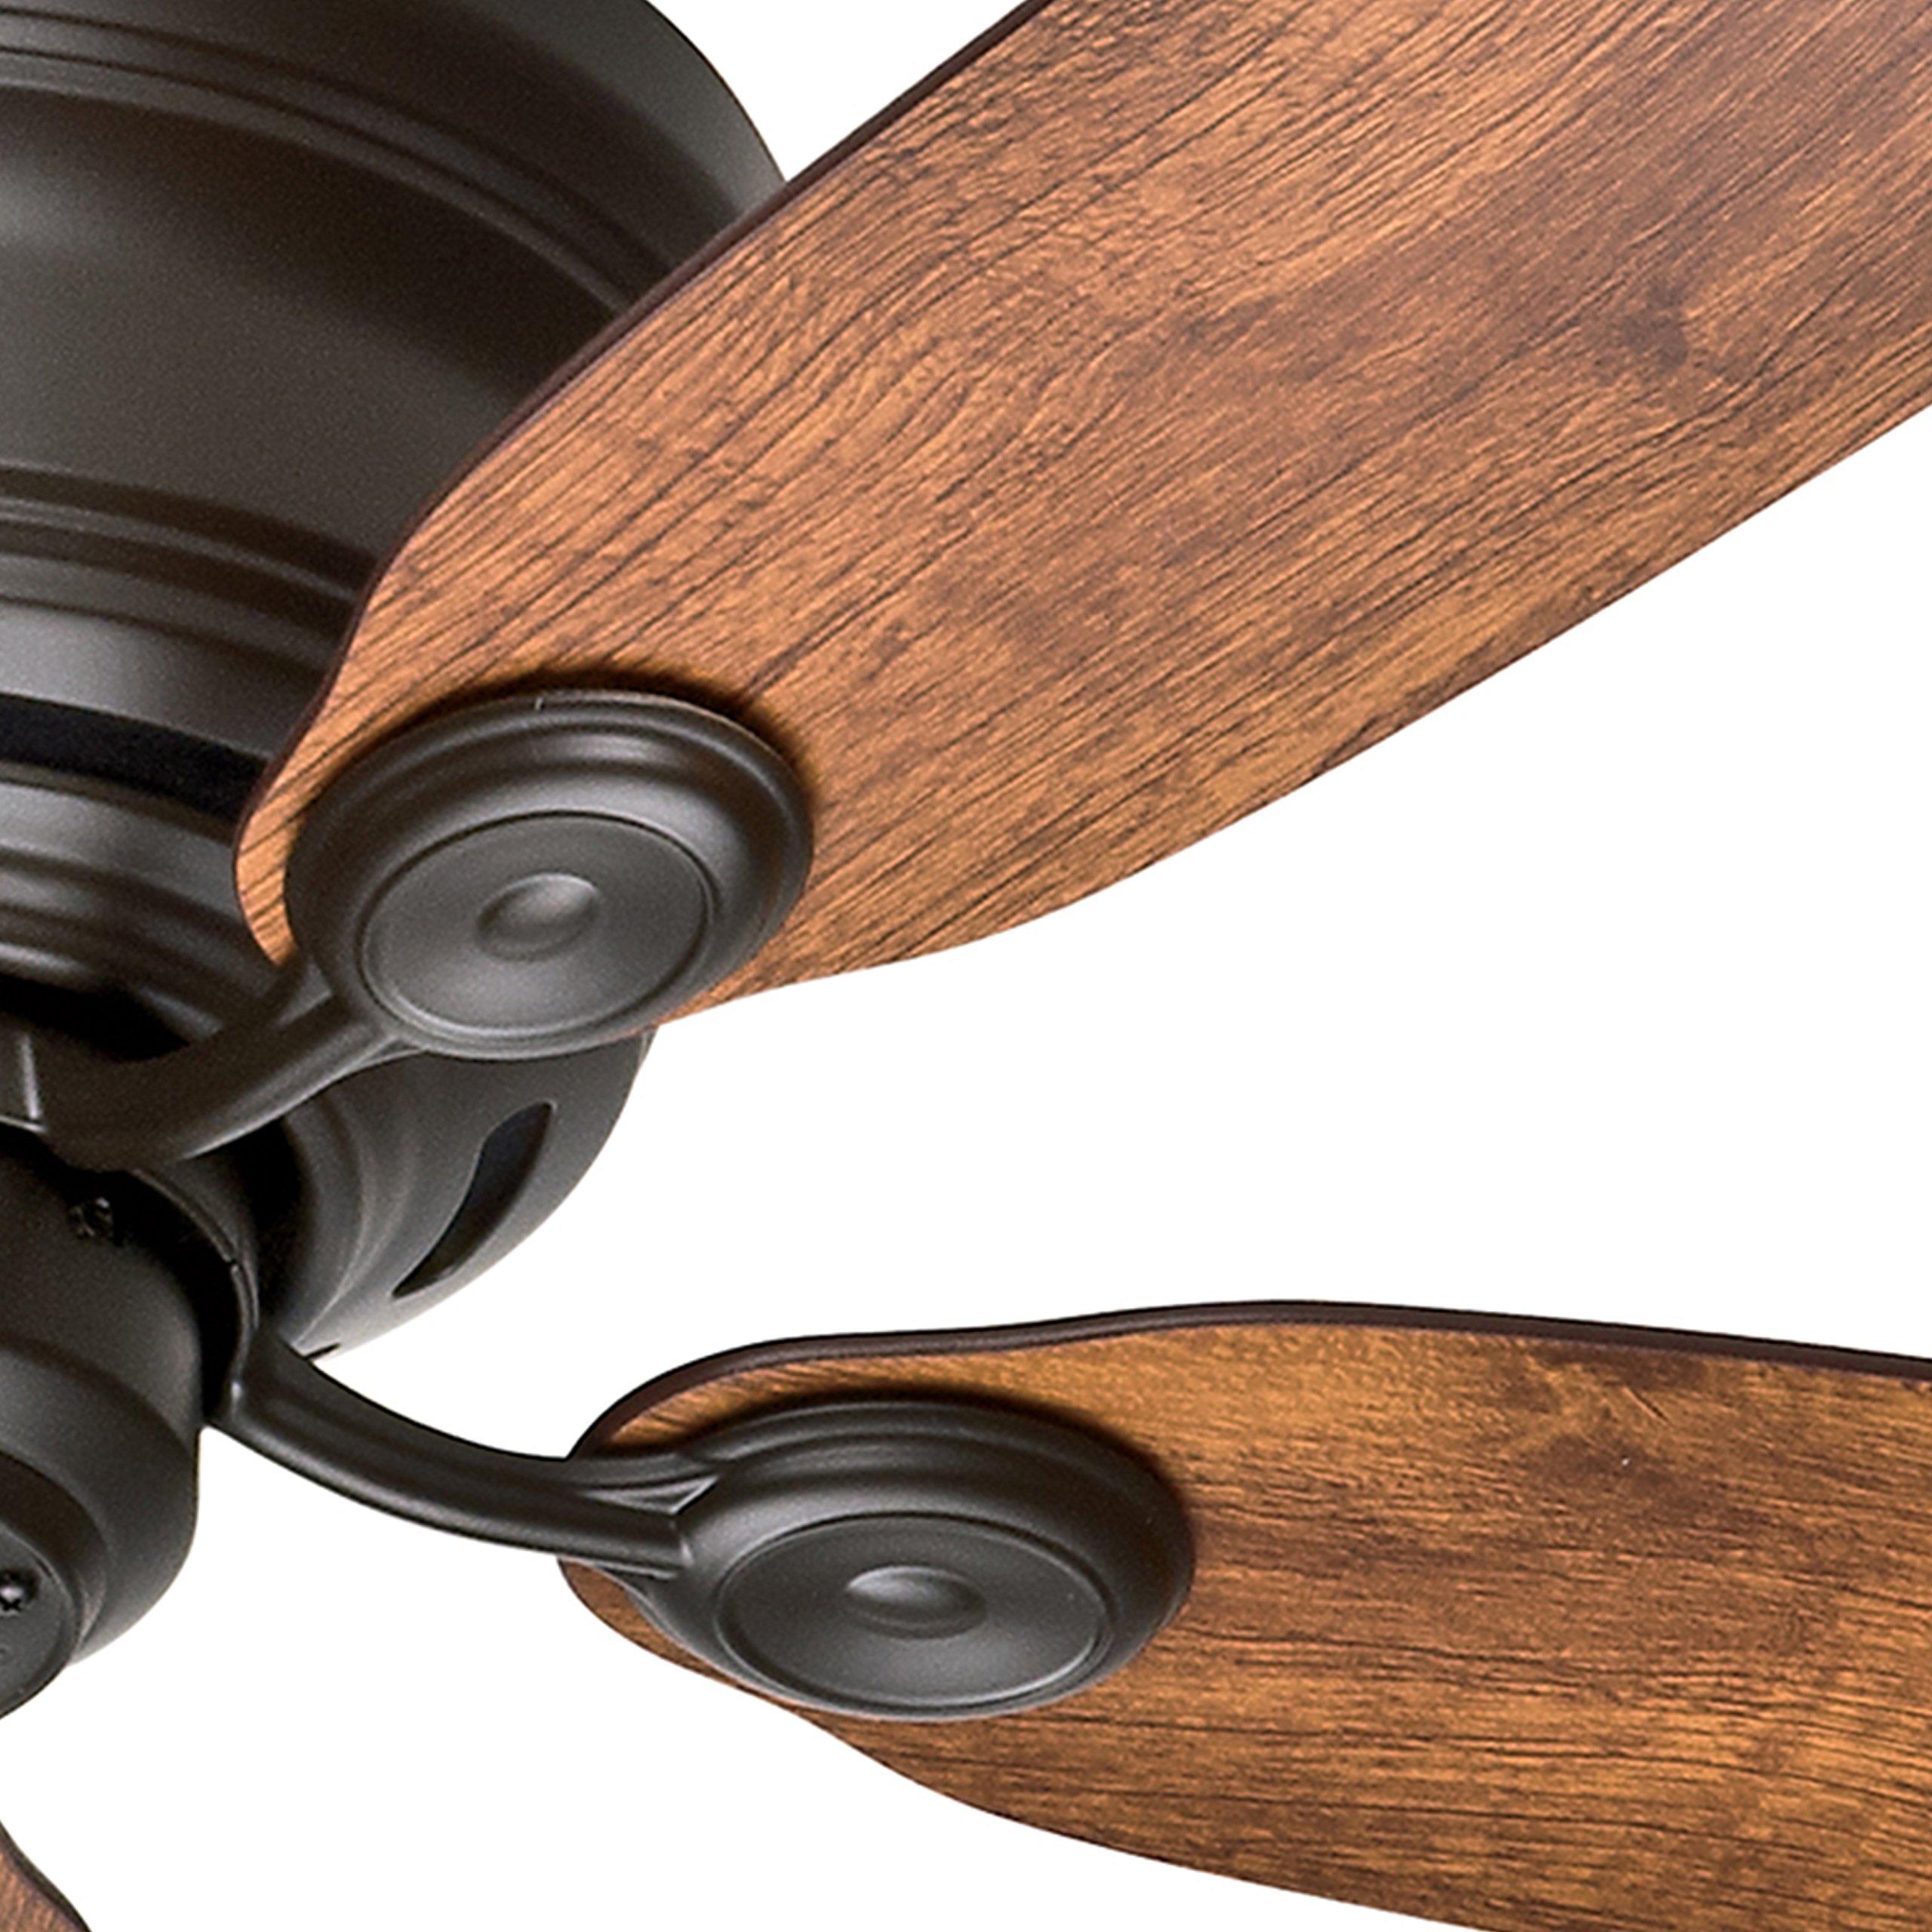 Hunter Fan 42'' New Bronze Finish Low Profile Ceiling Fan with Reversible Weathered Oak / Wine Country Blades (Certified Refurbished) by Hunter Fan Company (Image #4)